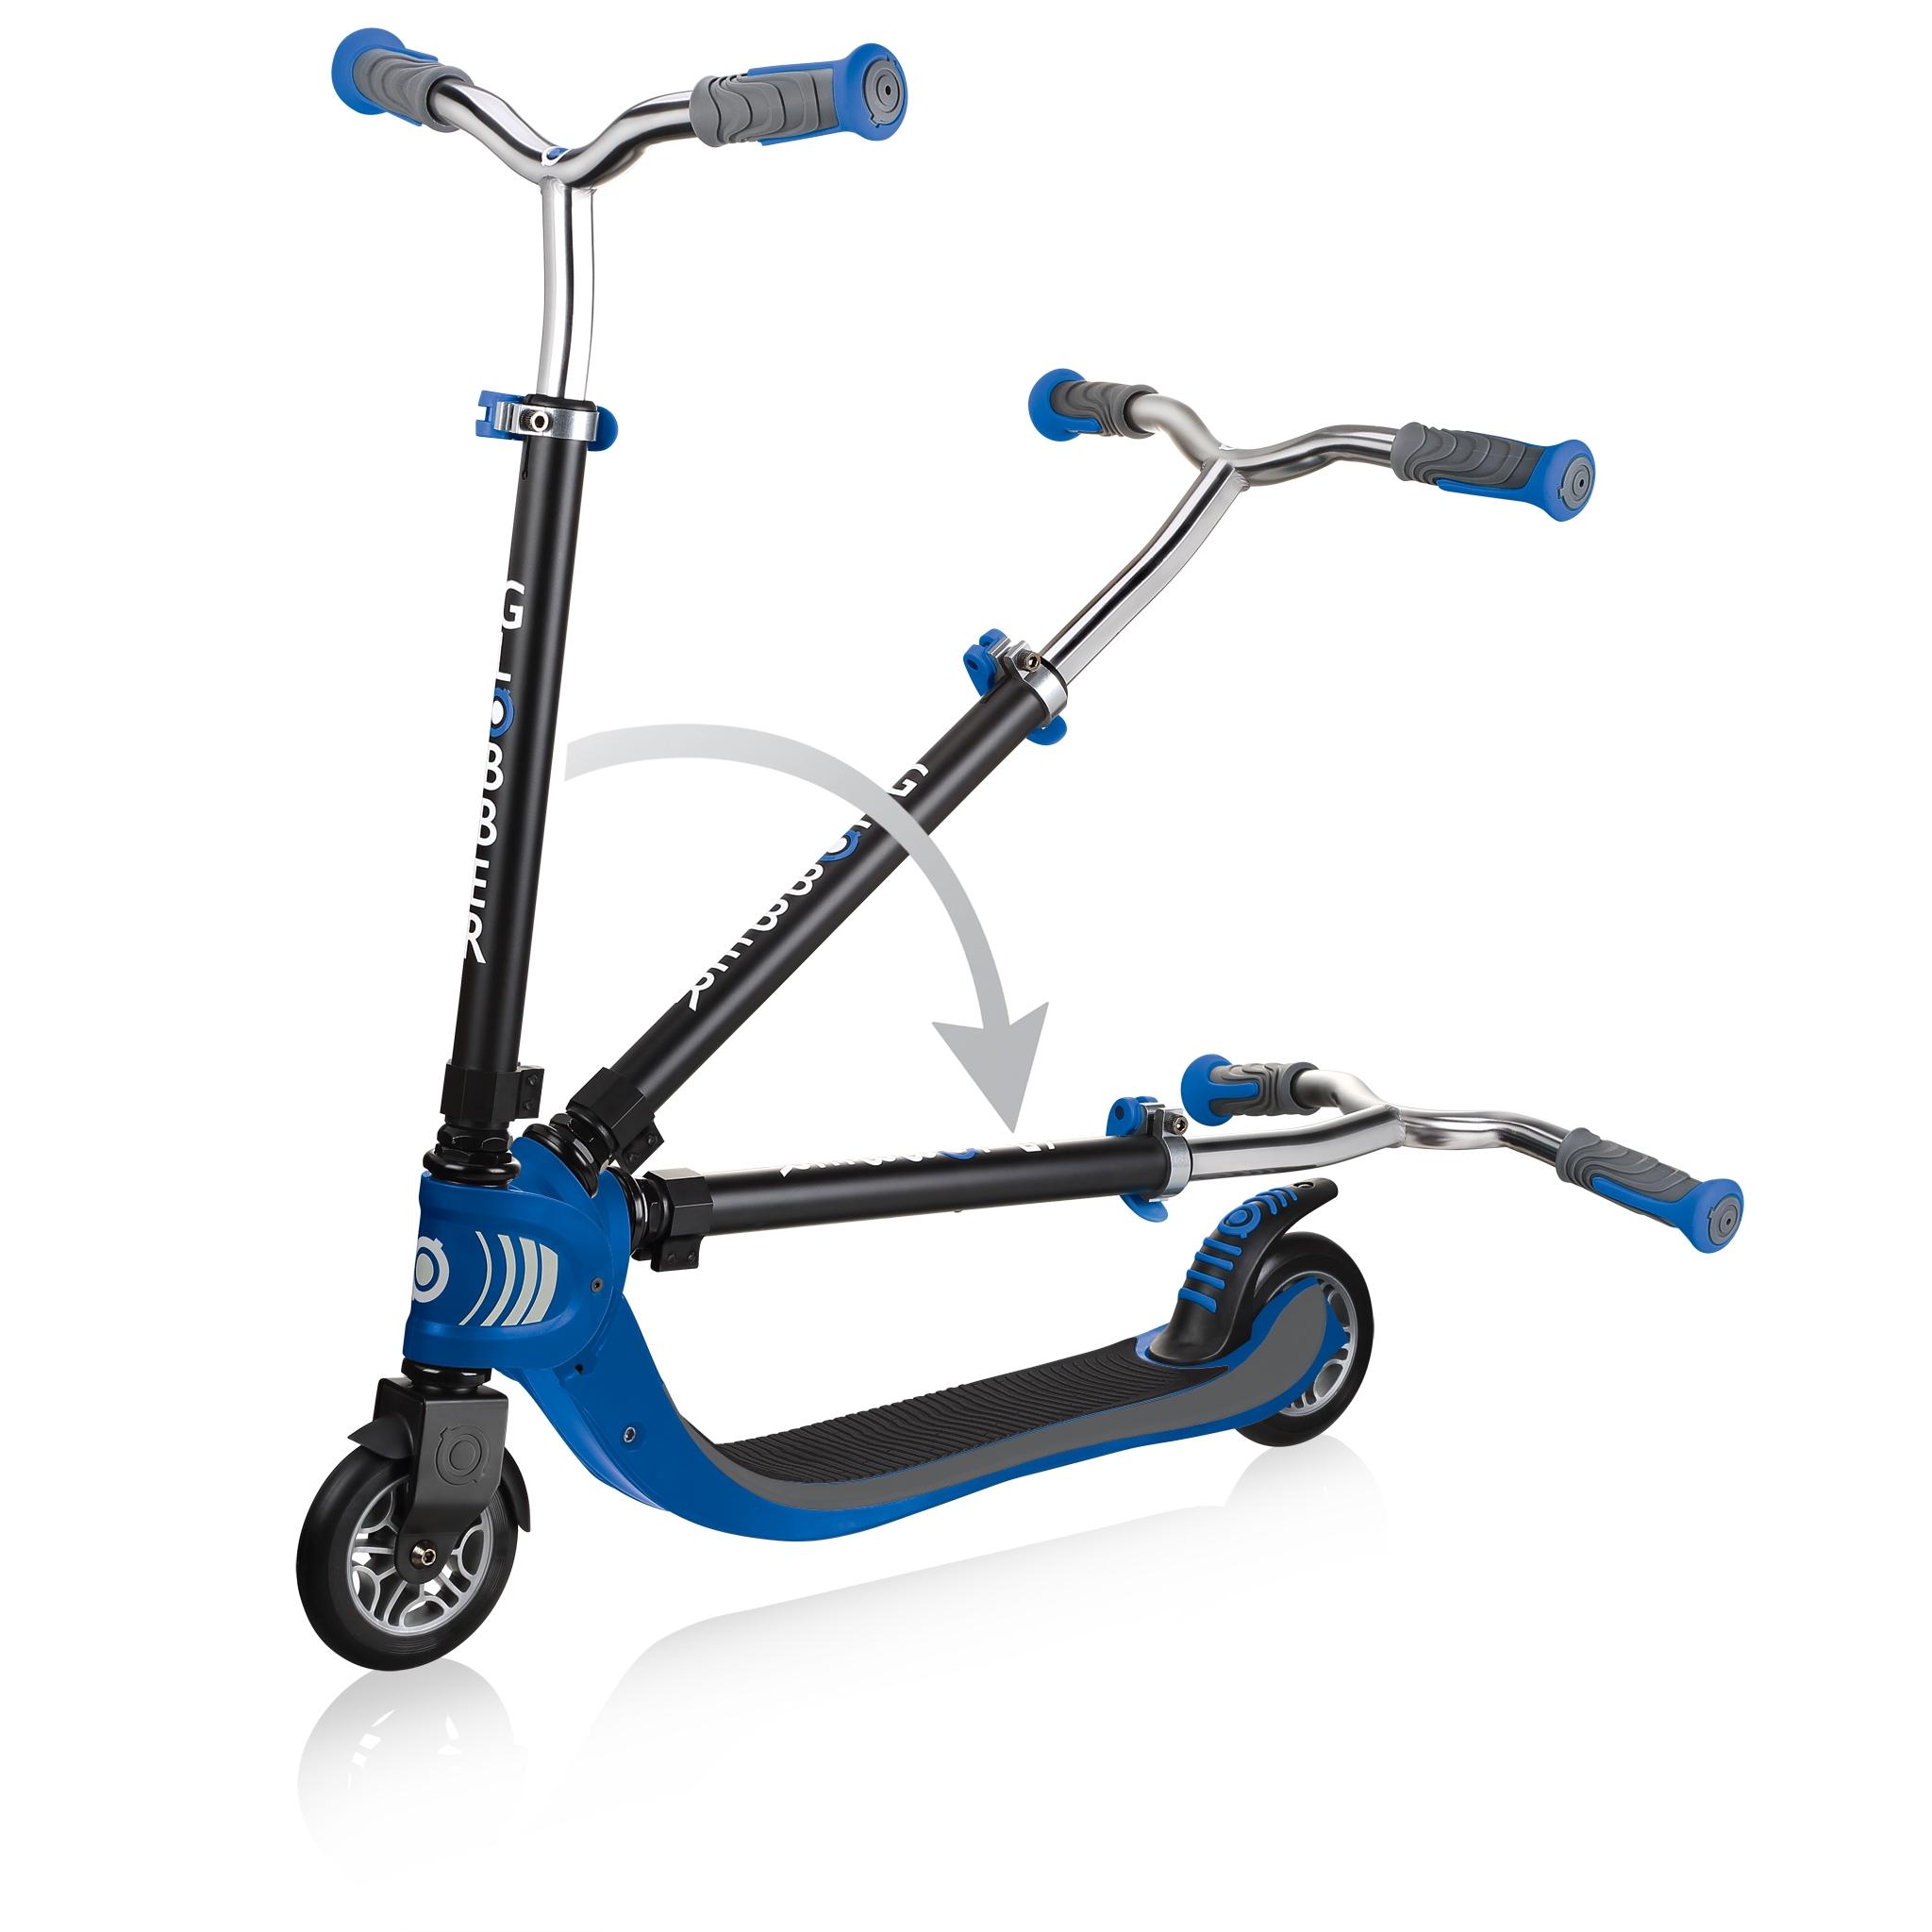 FLOW-FOLDABLE-125-2-wheel-folding-scooter-for-kids-navy-blue 2